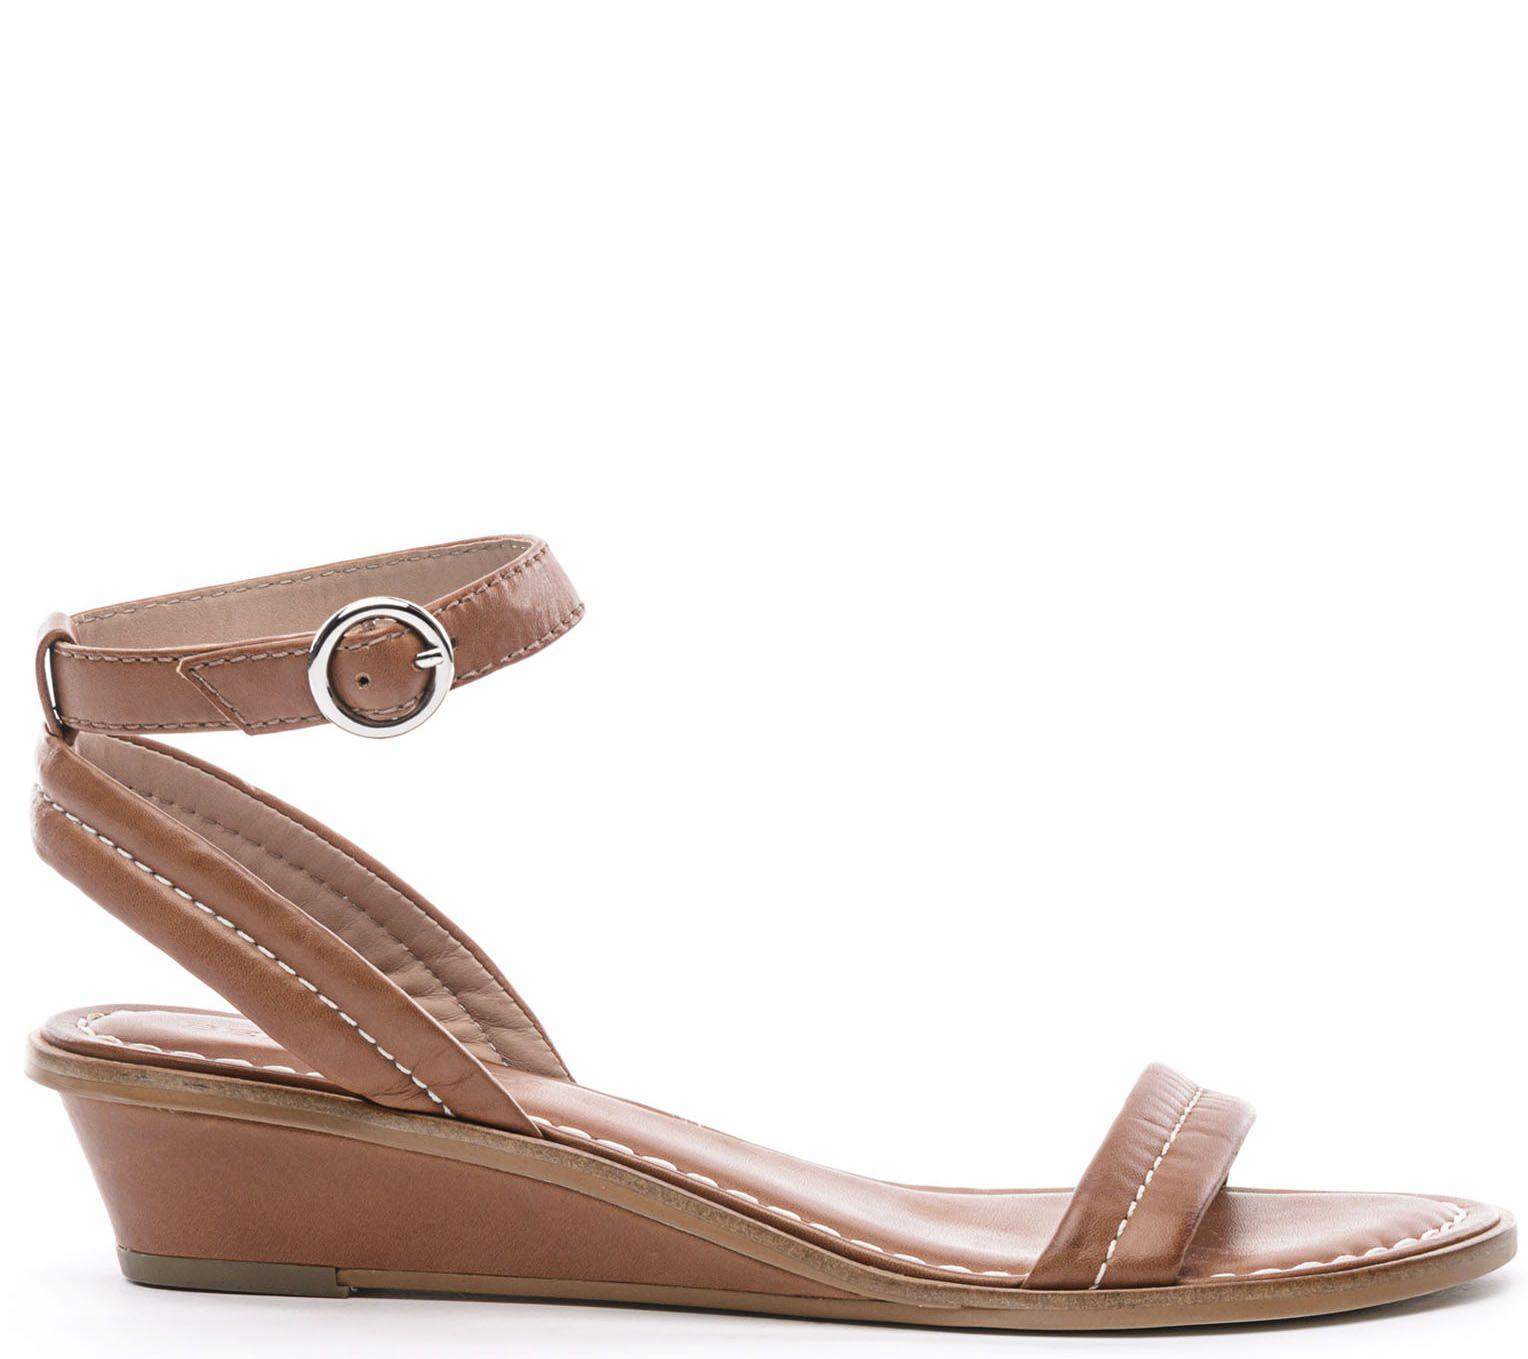 a57a06f9d1147 Bernardo Leather Sandals - Catherine — QVC.com